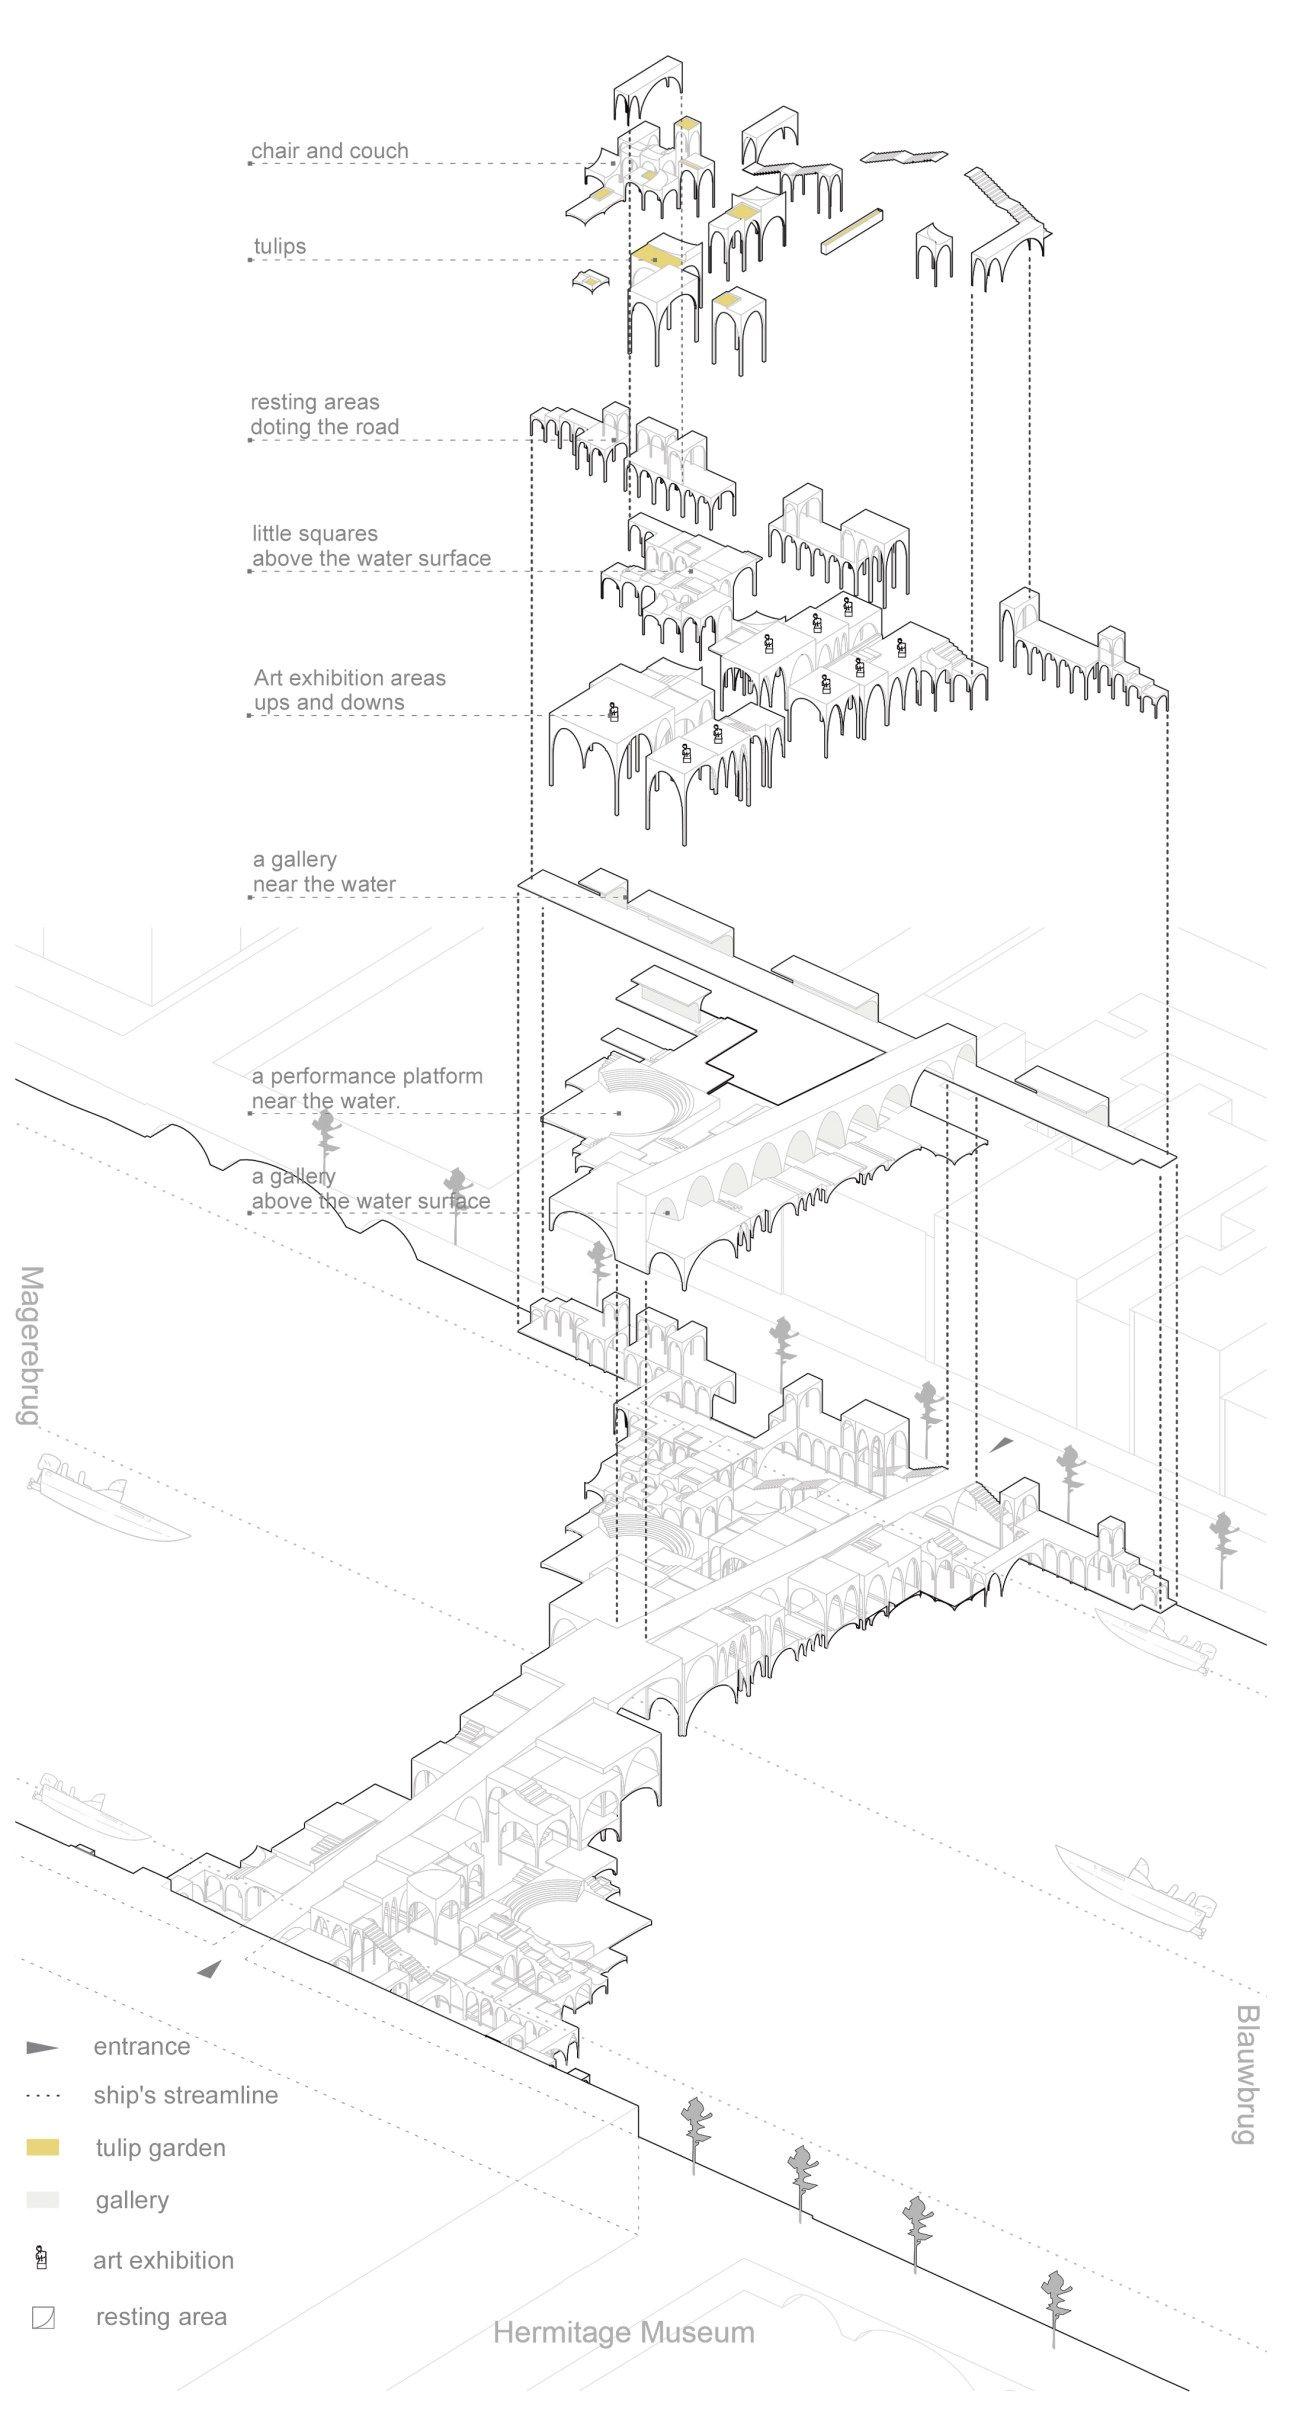 Pin De Daniela En Presentaciones Arquitectura